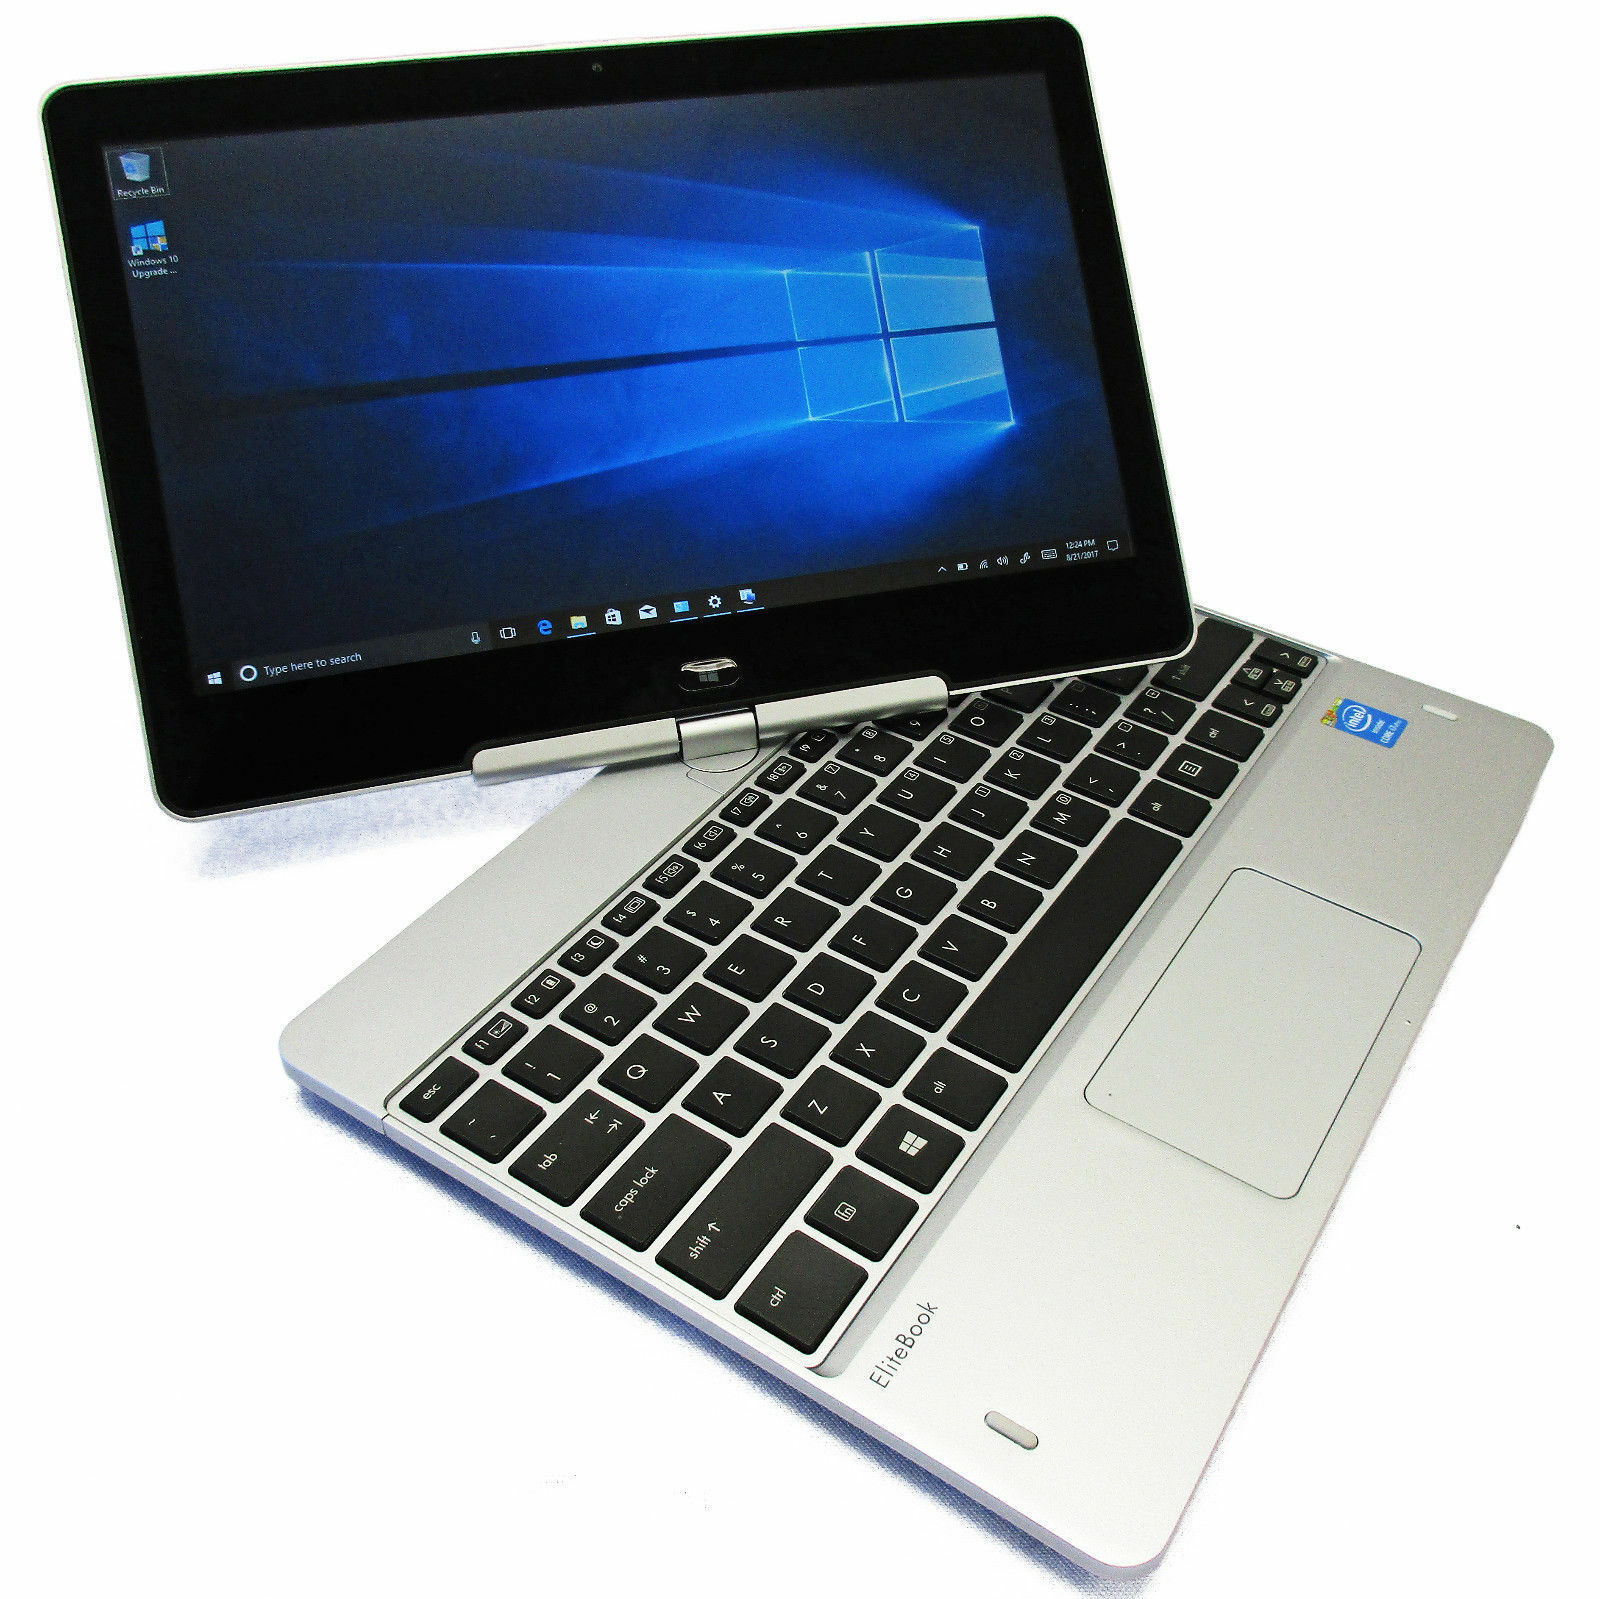 HP Elitebook Revolve 810 G3 - Ultrabook